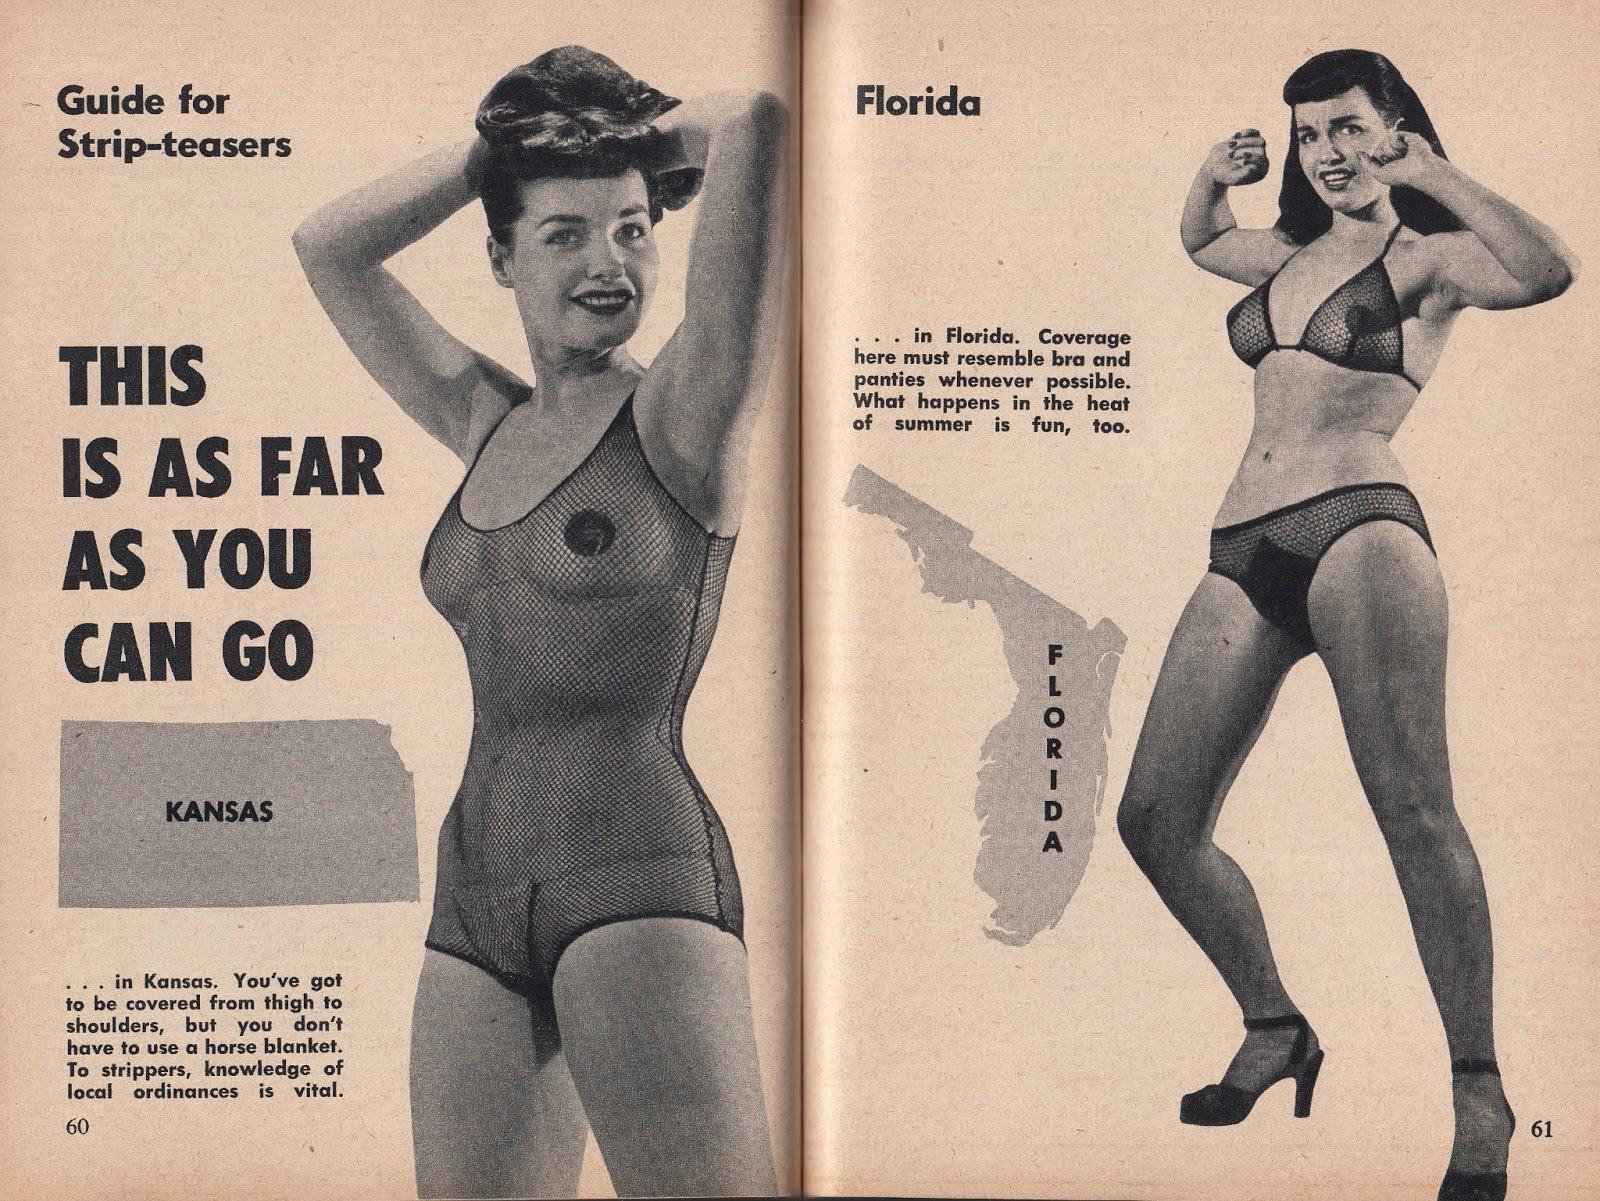 Marilyn monroe nude legs spread interesting phrase